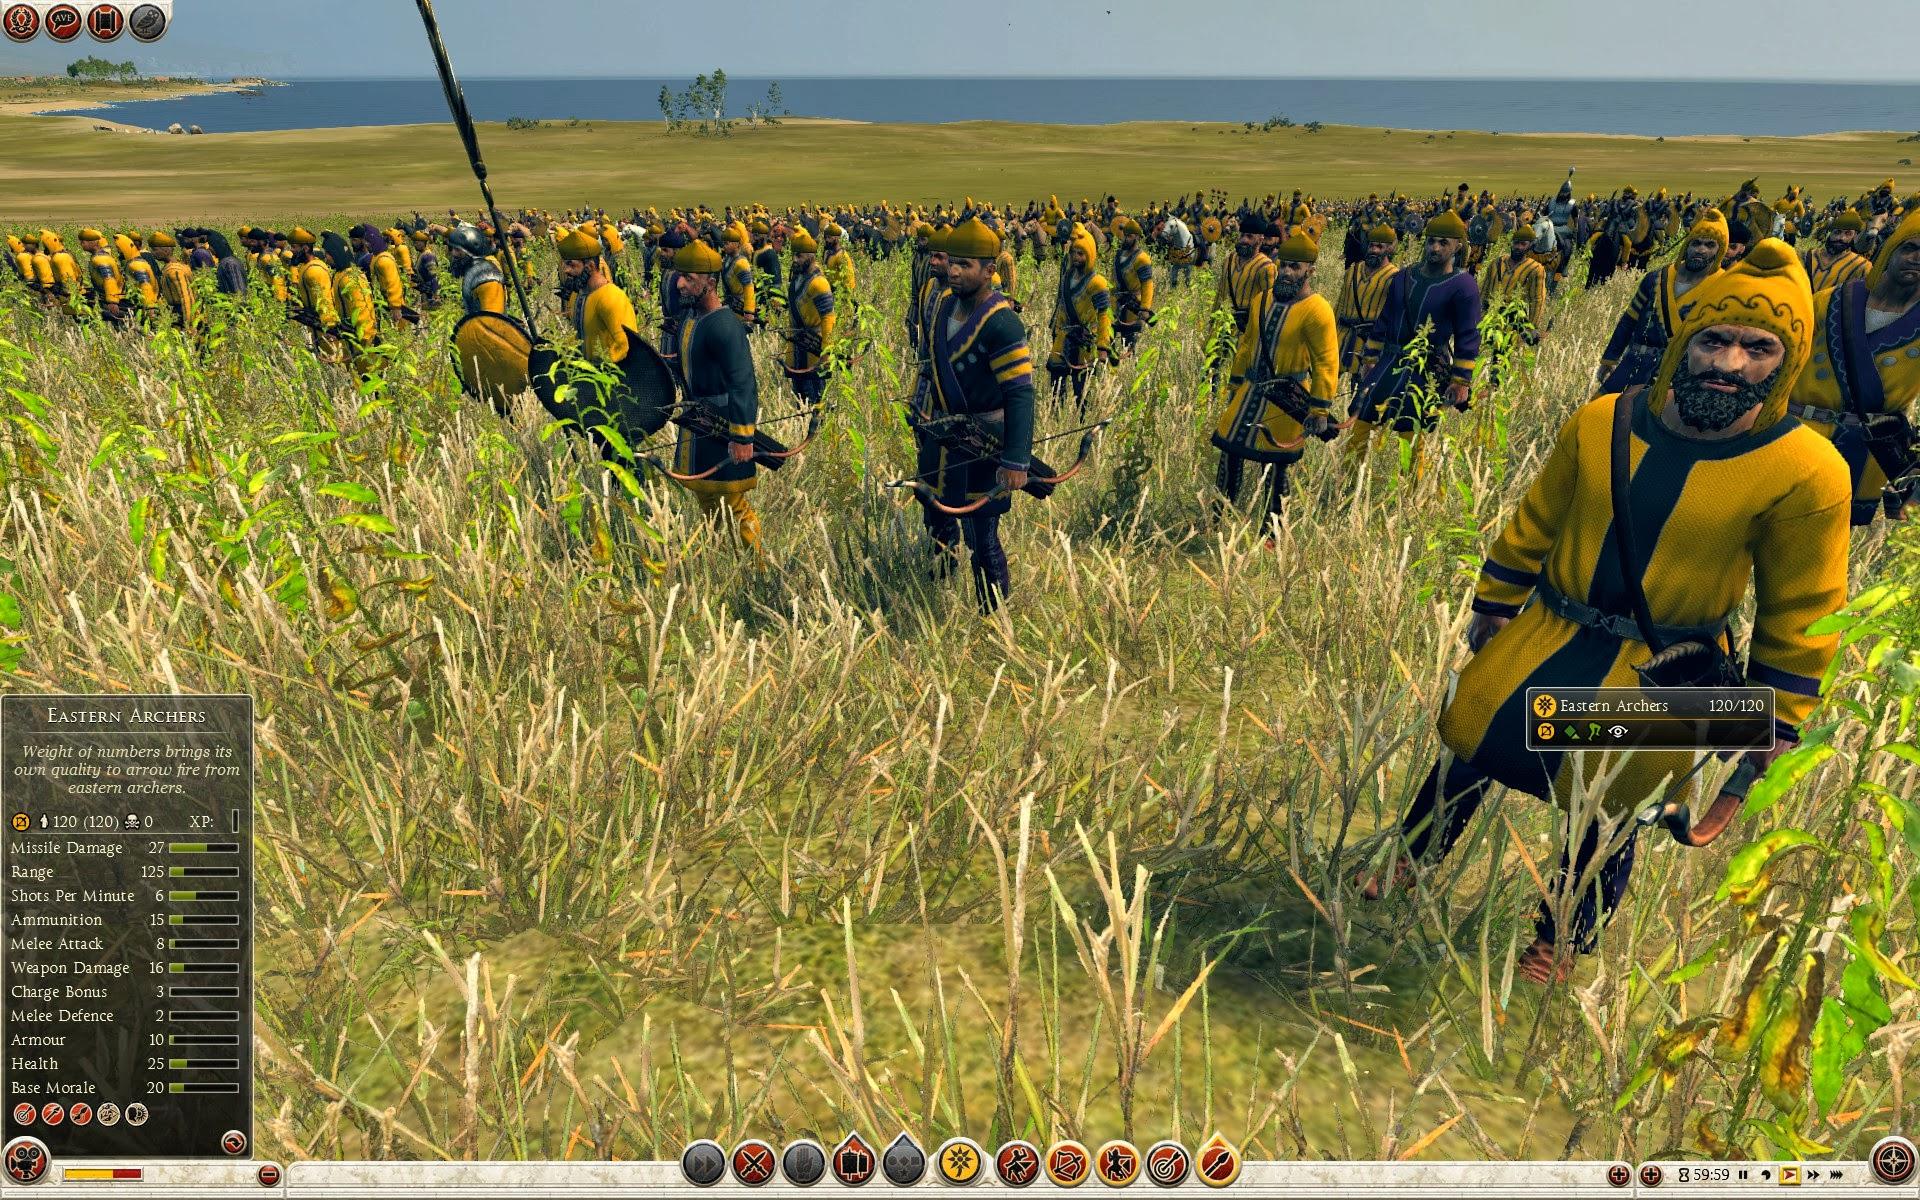 Eastern Archers